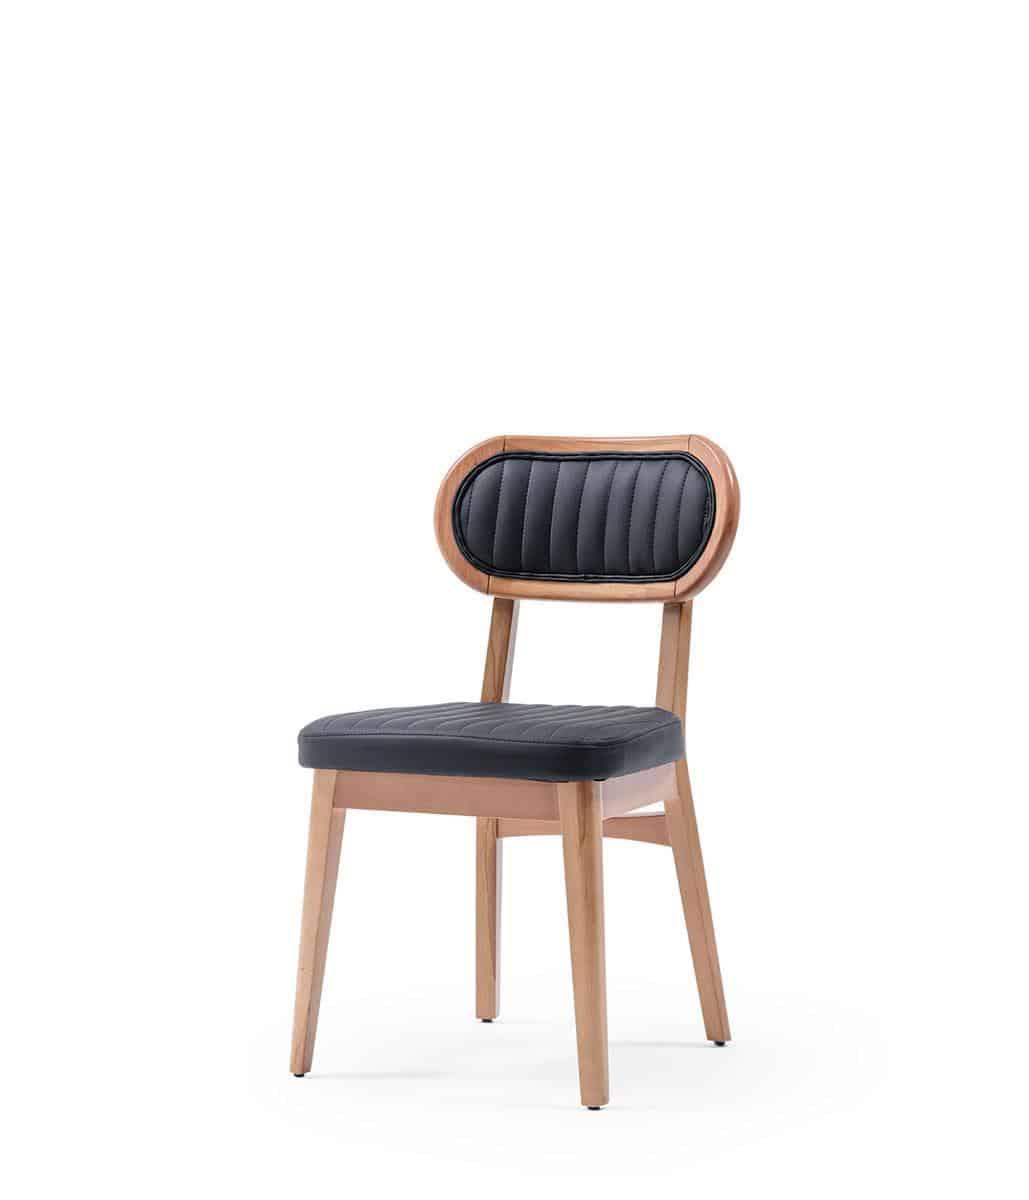 urun-iglo-sandalye-01